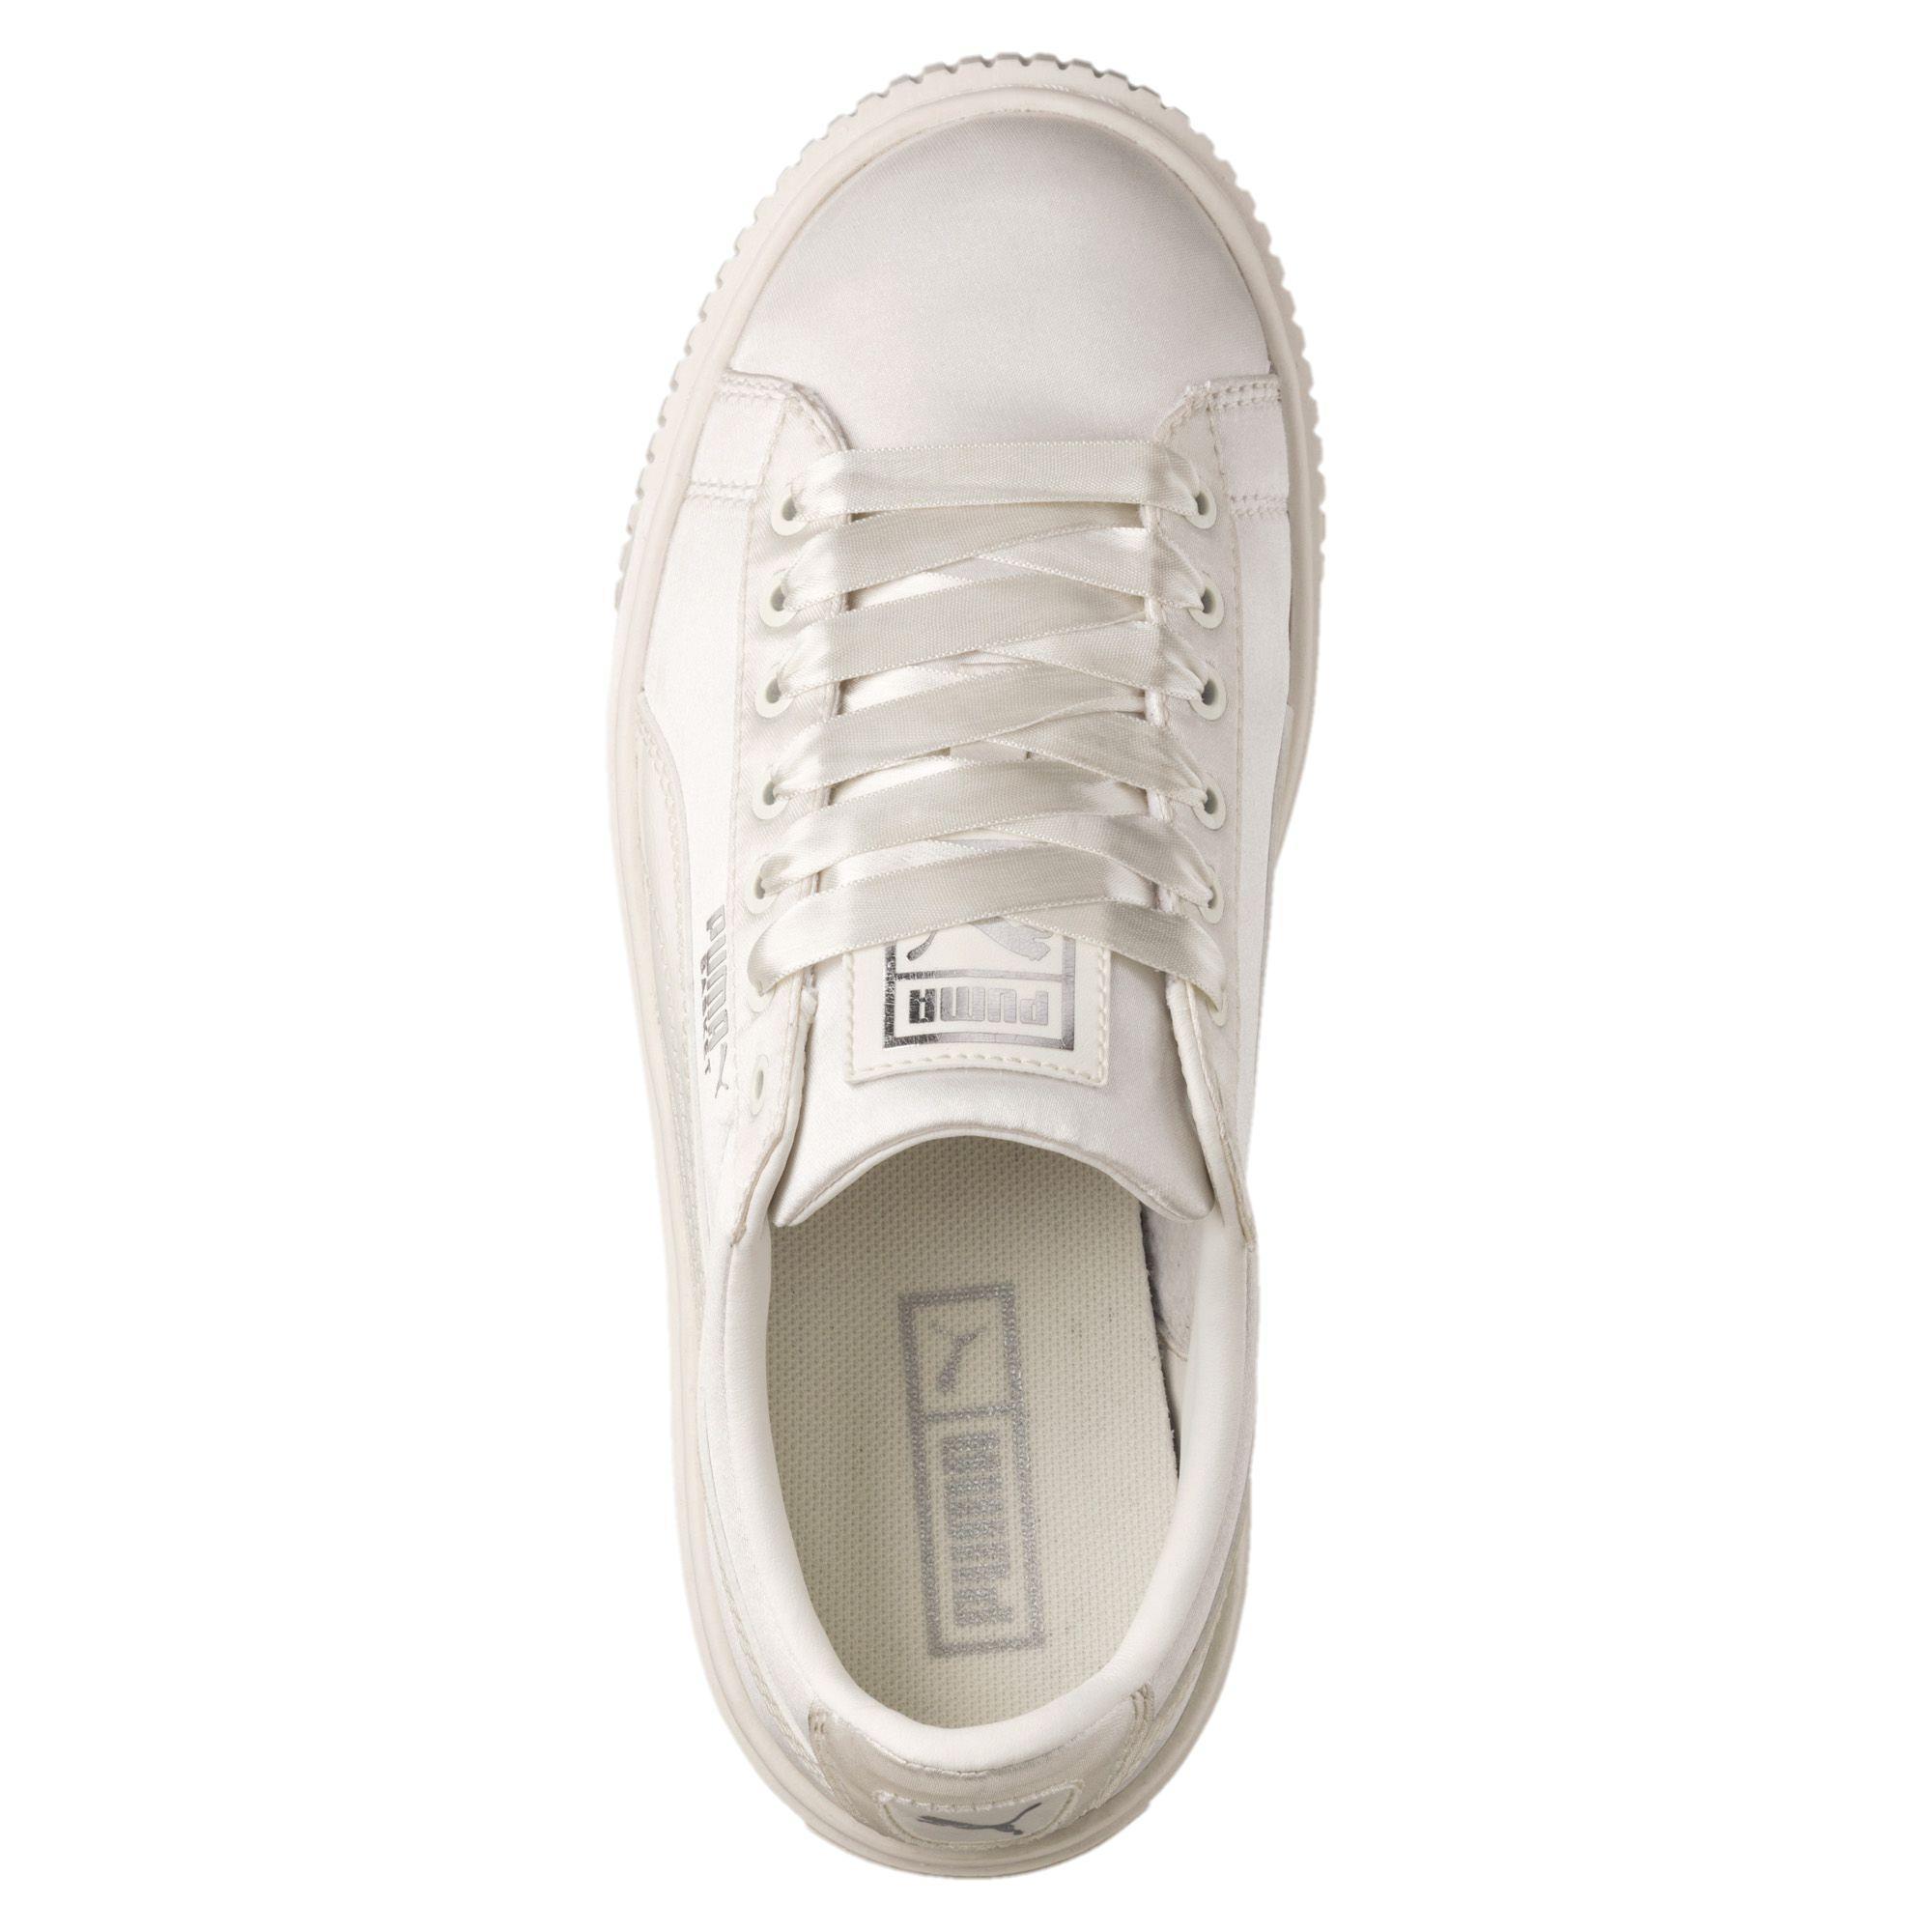 new product 86fe6 ab02c Puma Shoes Basket Platform Tween PS Junior